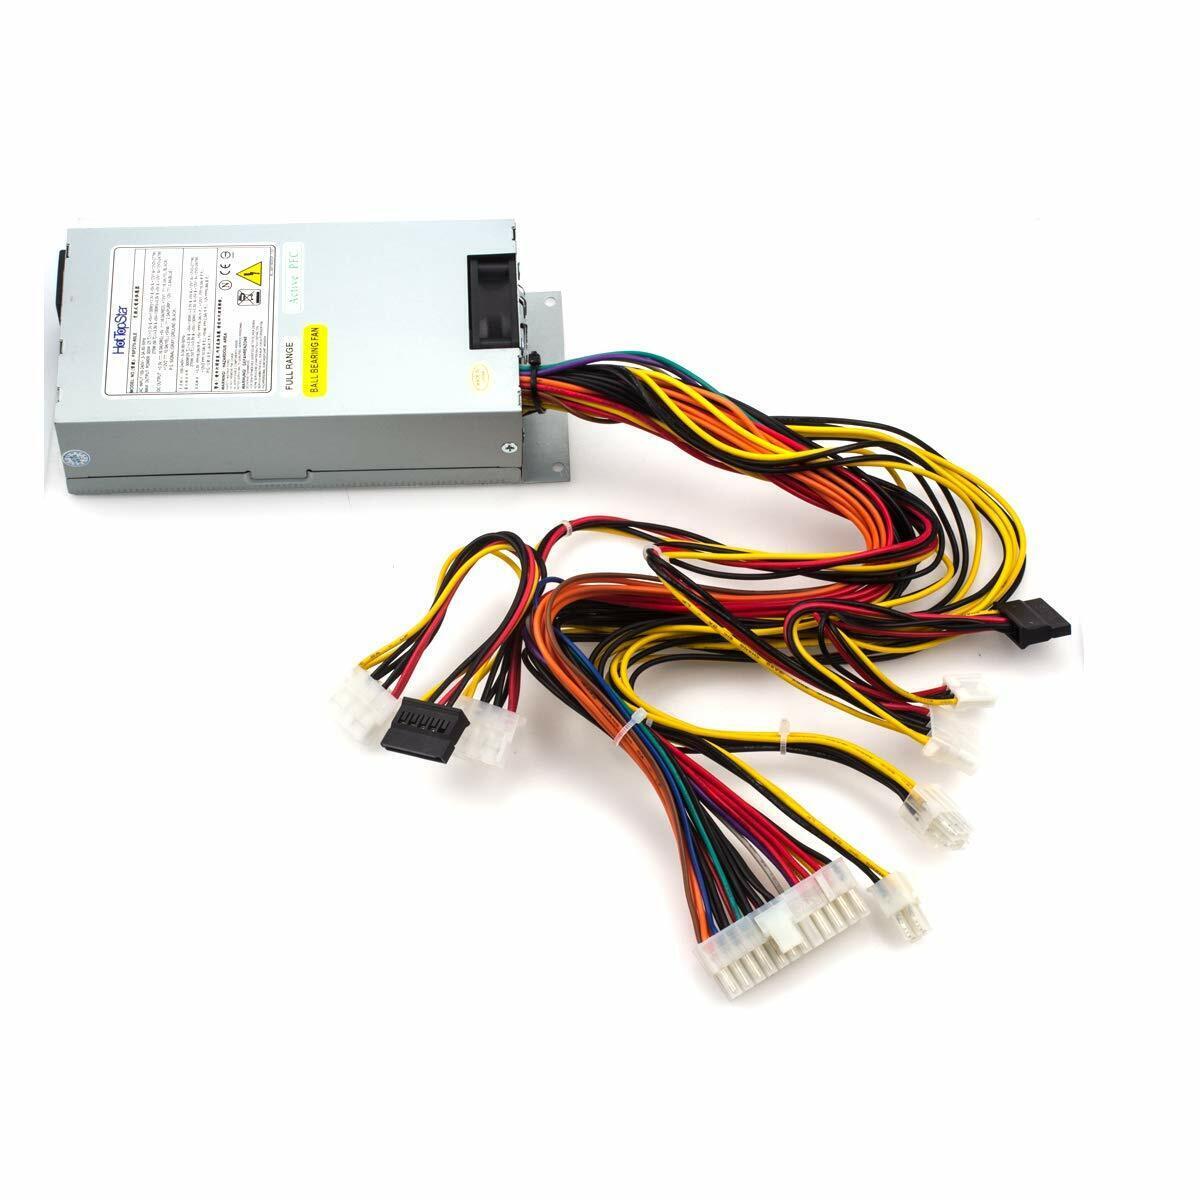 270W FSP270-60LE PSU for Mini ITX 1U Server Power Supply Fle